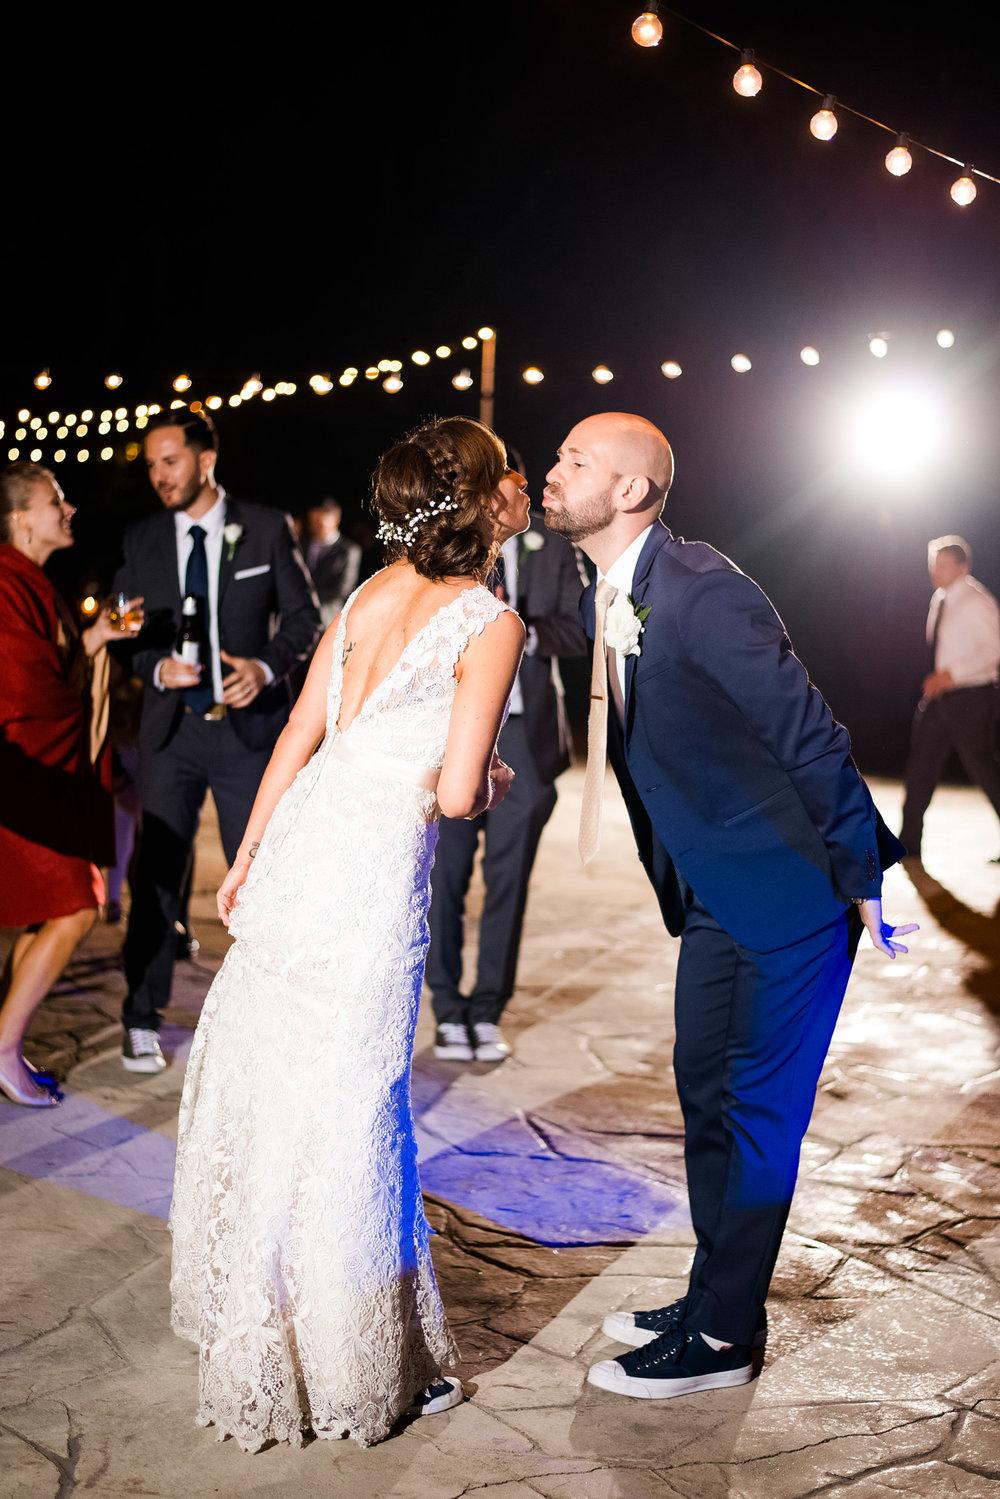 LAUREN + DAVID | CHARLESTON WEDDINGS-121.JPG